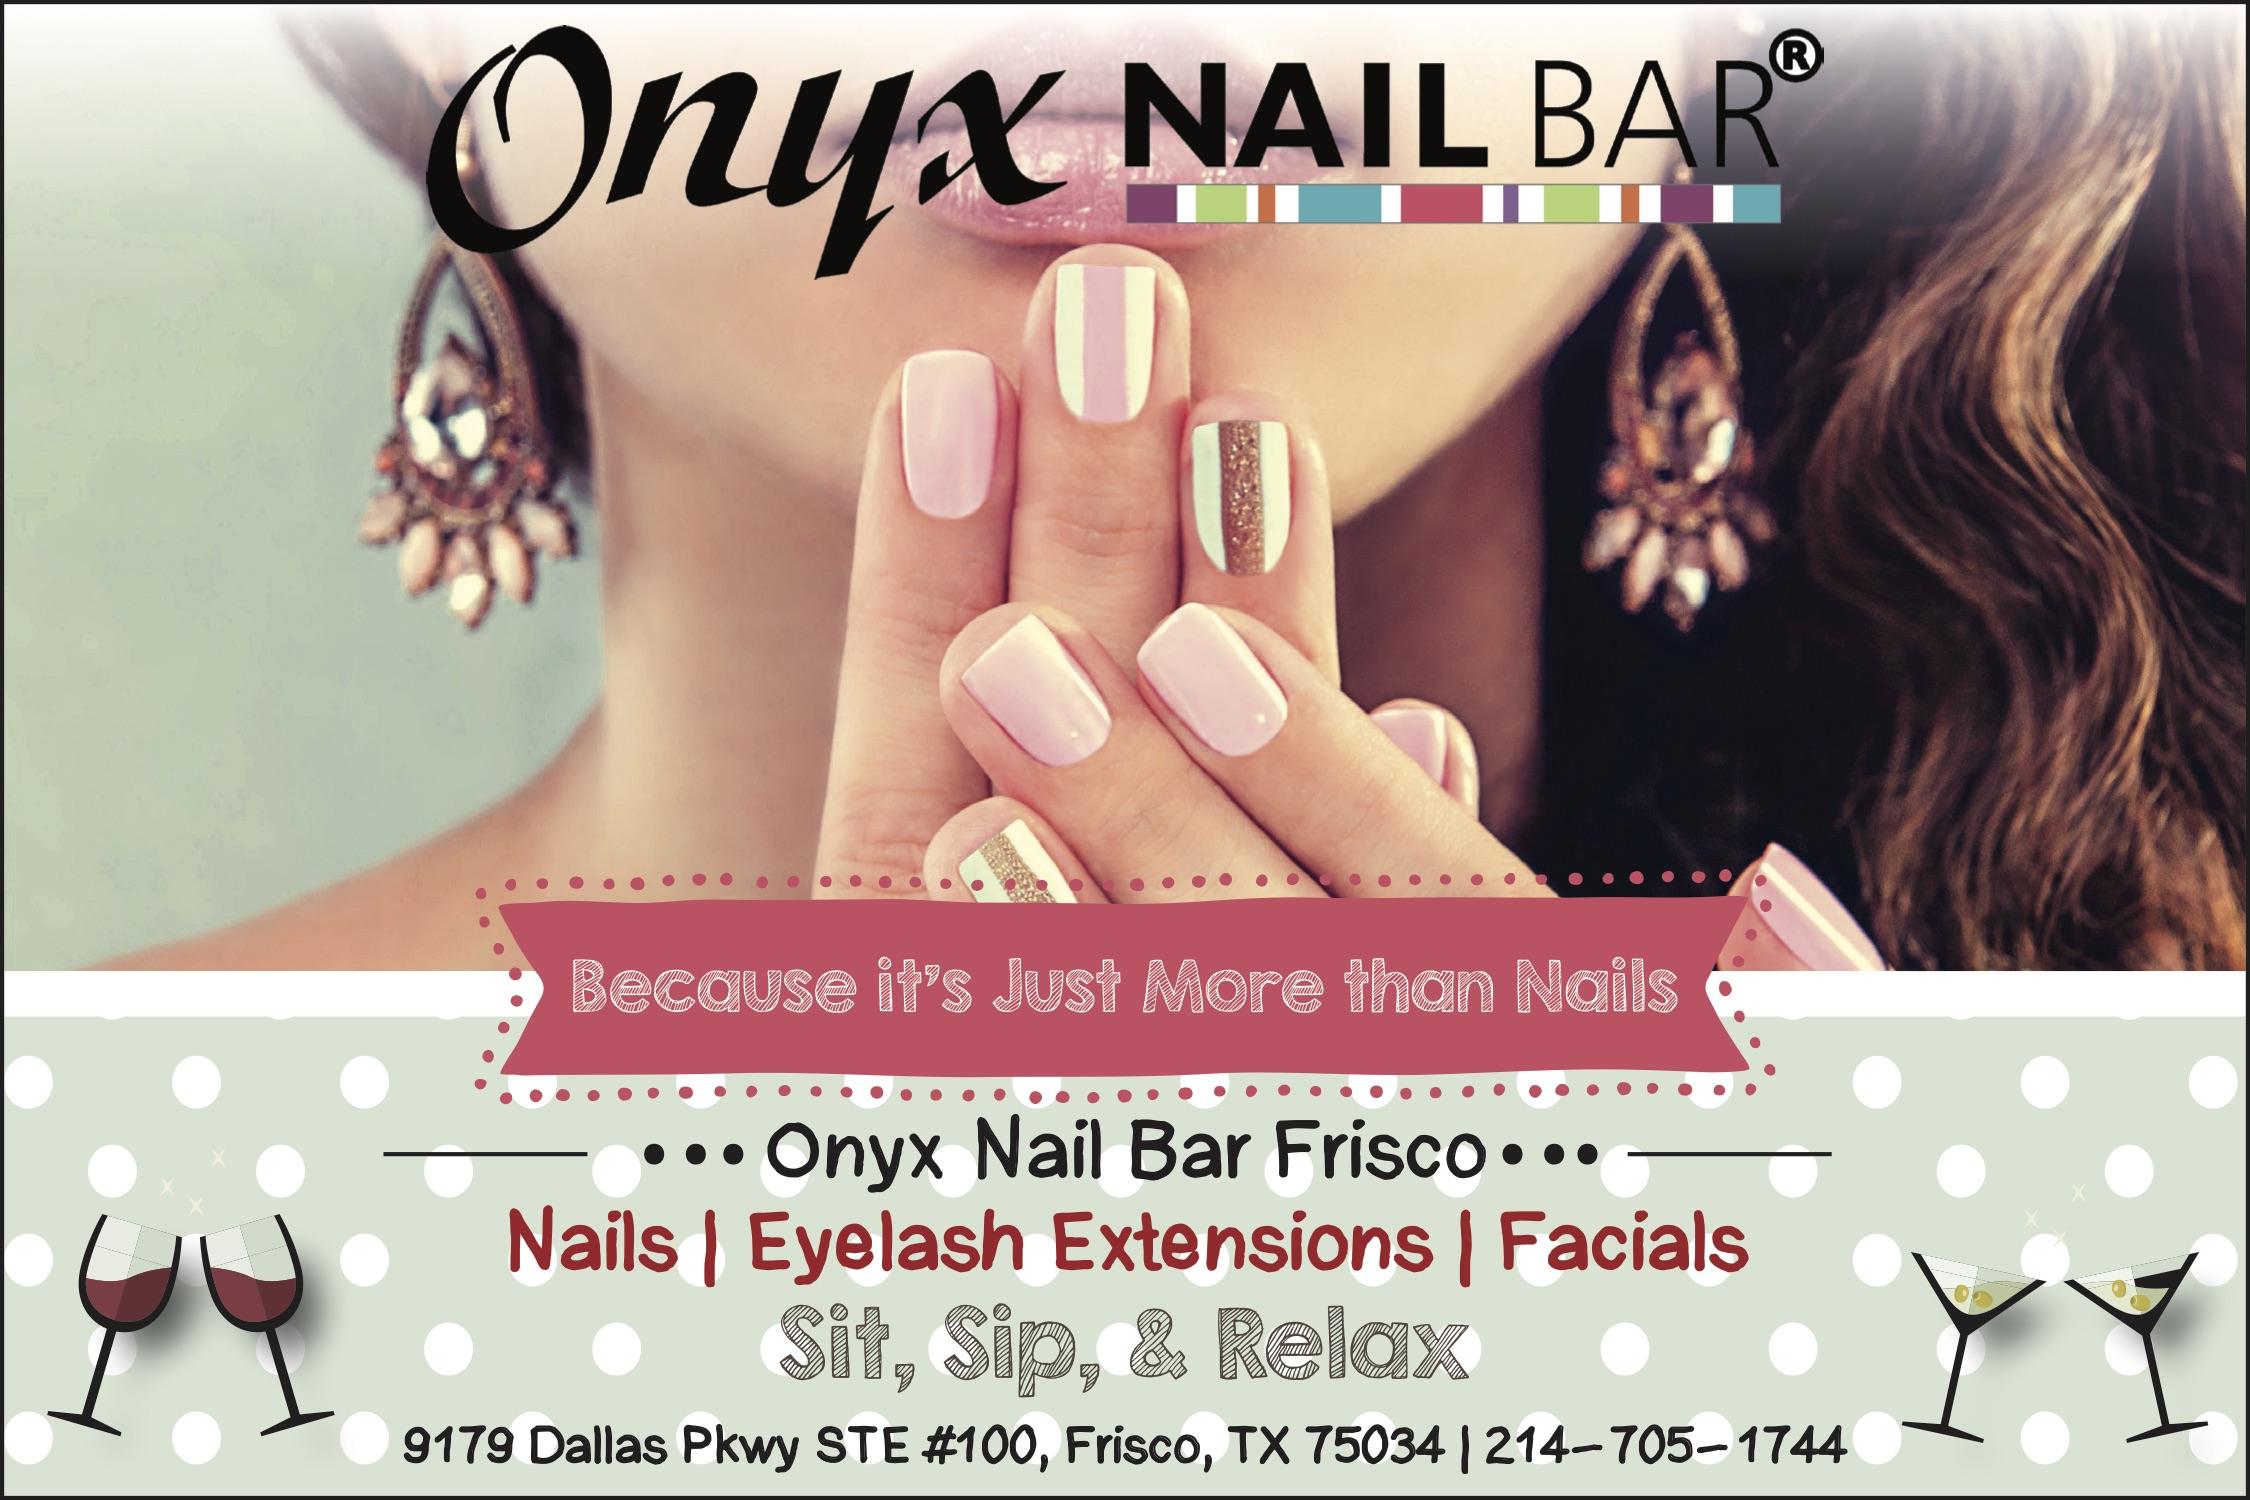 onyx_nail_bar_frisco-121205_1_2pg_Aug201